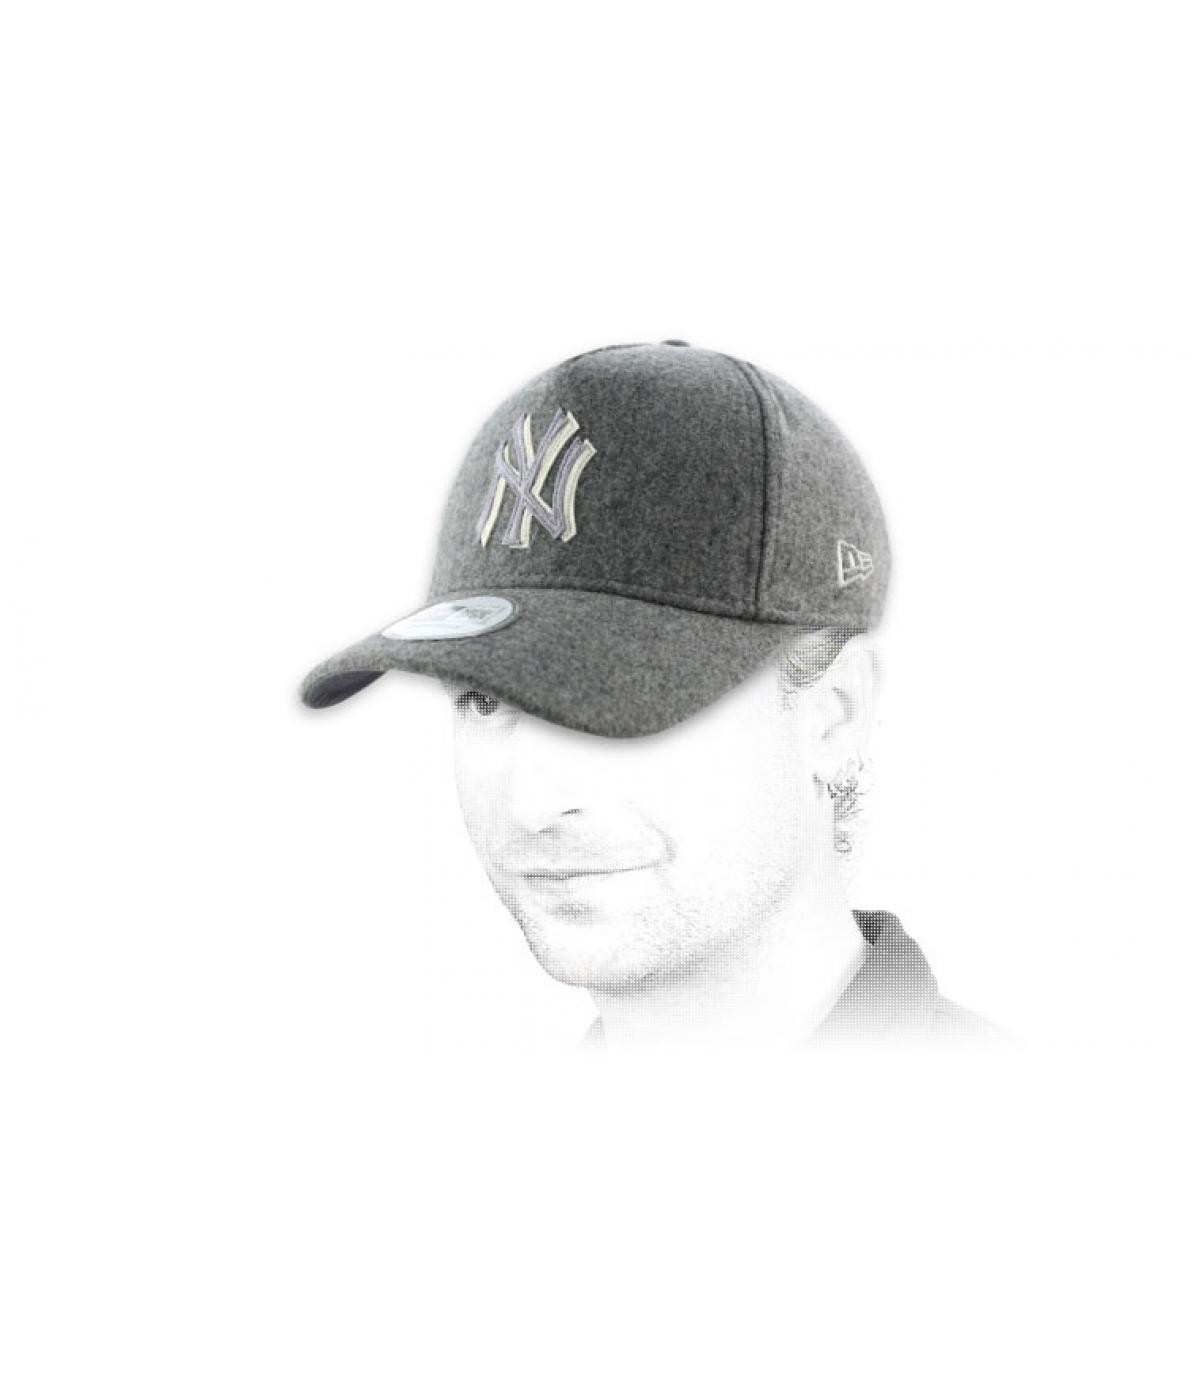 Wool felt adjustable NY gray cap